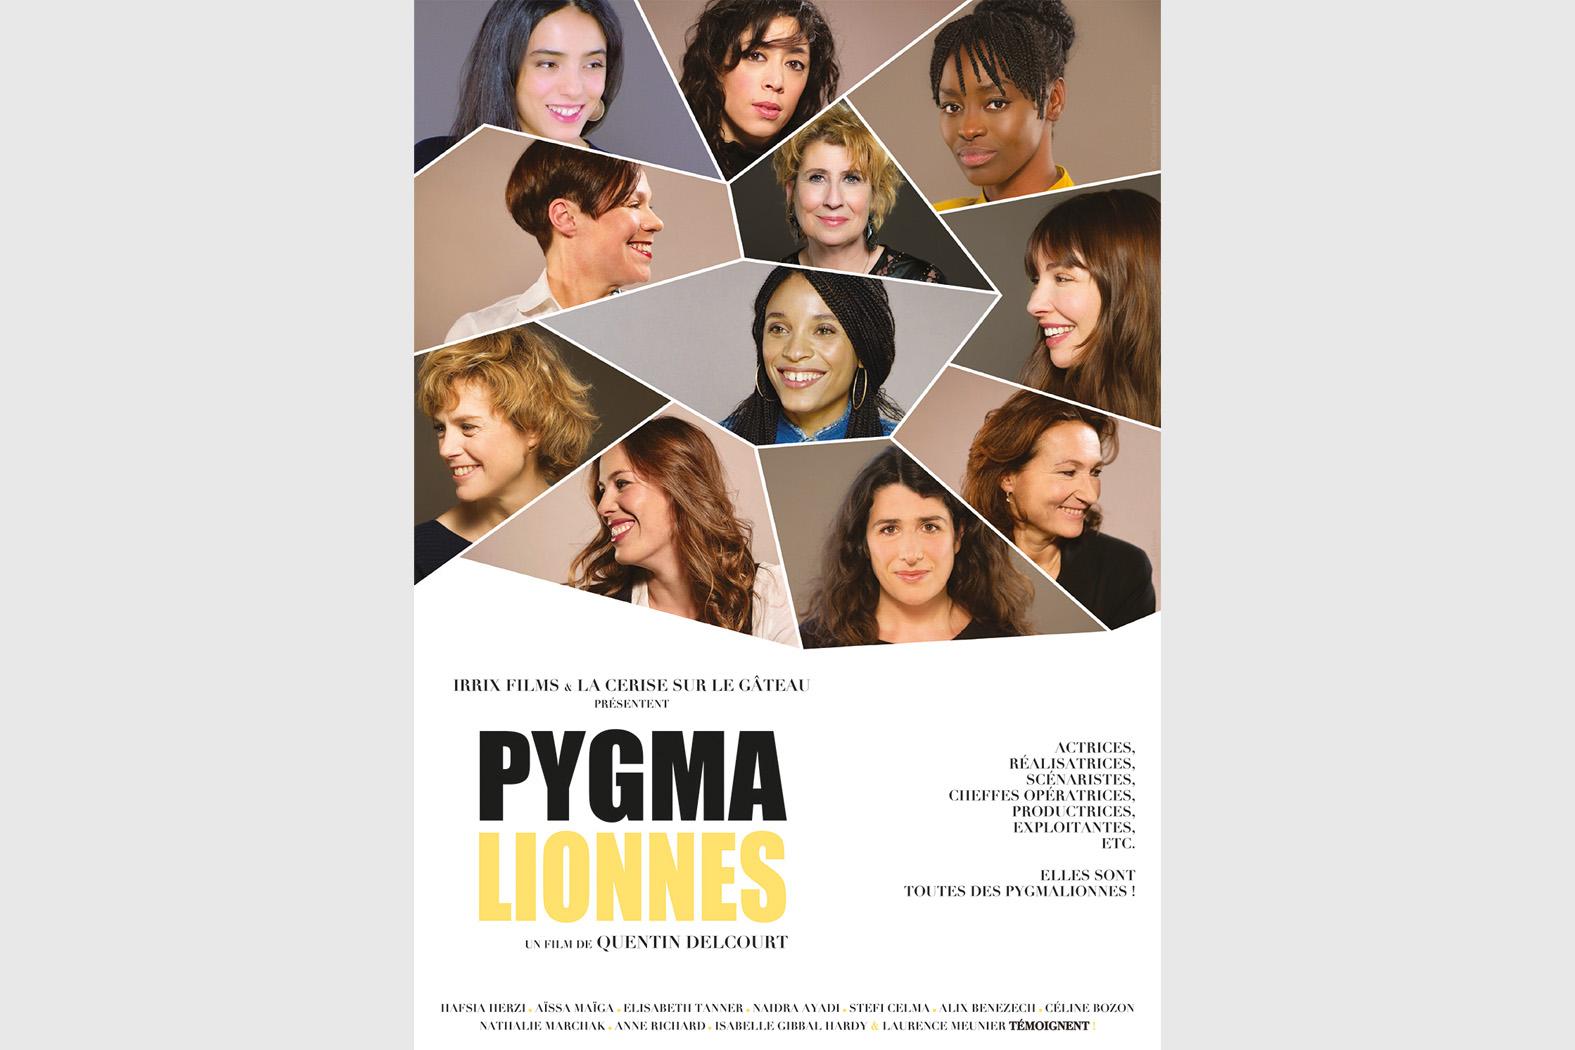 Pygmalionnes1